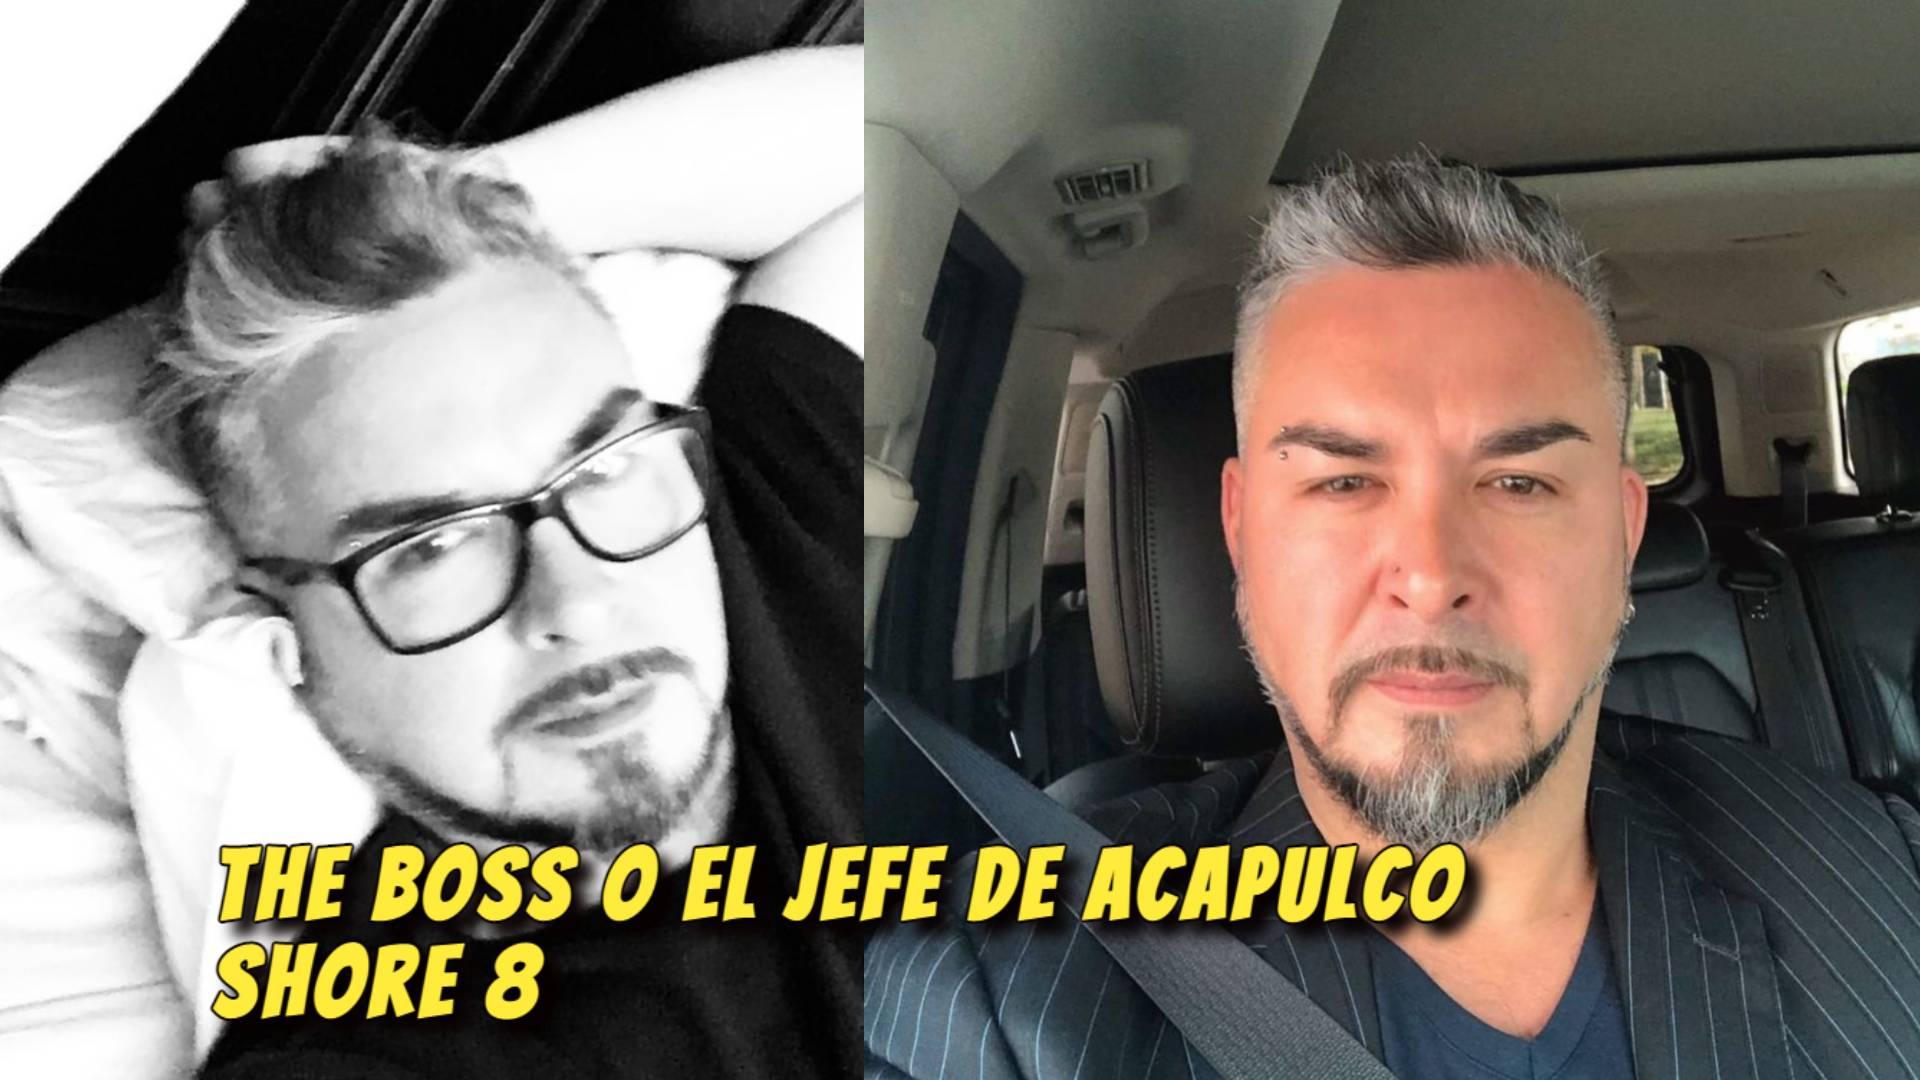 The Boss O El Jefe Llega En Yate a Acapulco shore 8; Quien es The Boss O El Jefe de Acapulco shore 8